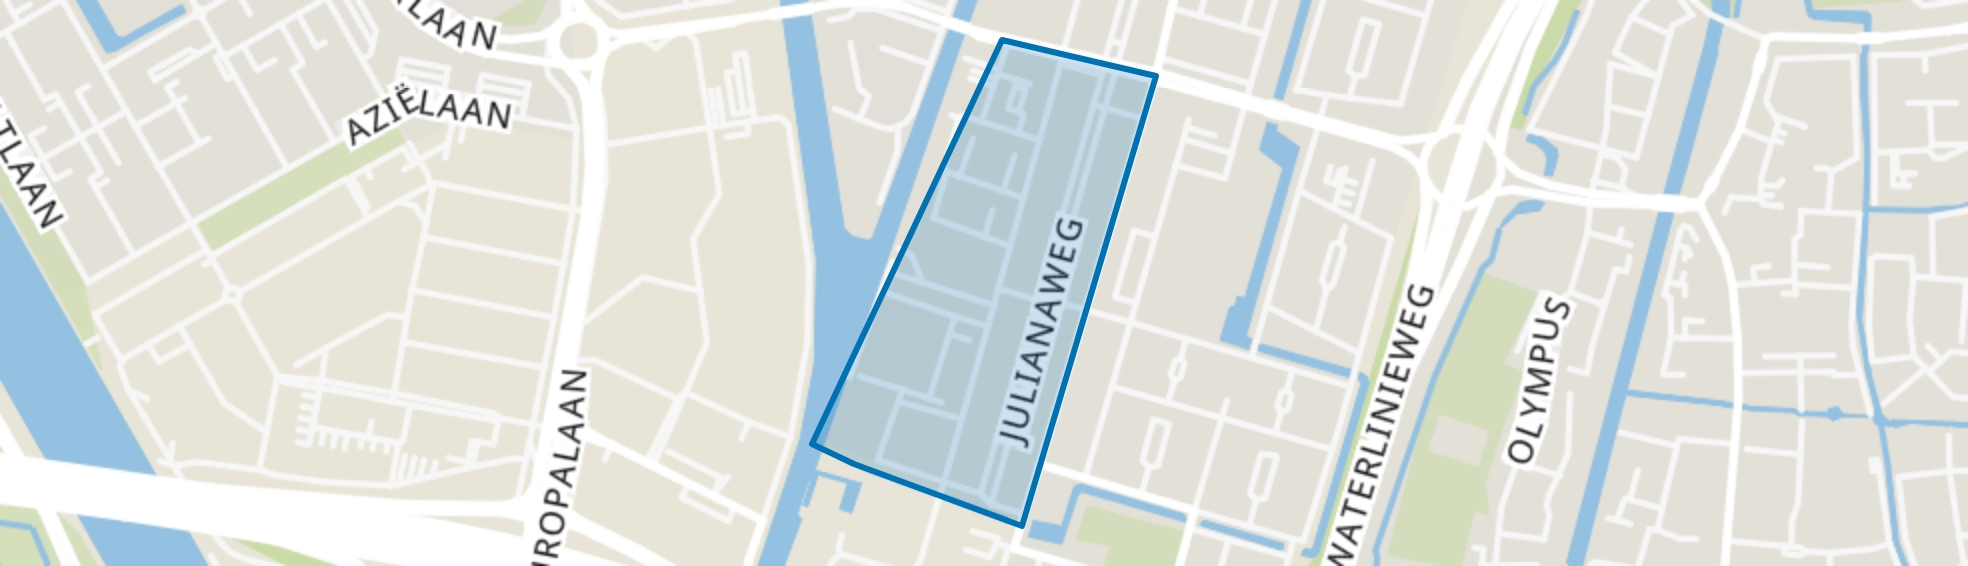 Oud Hoograven-Zuid, Utrecht map